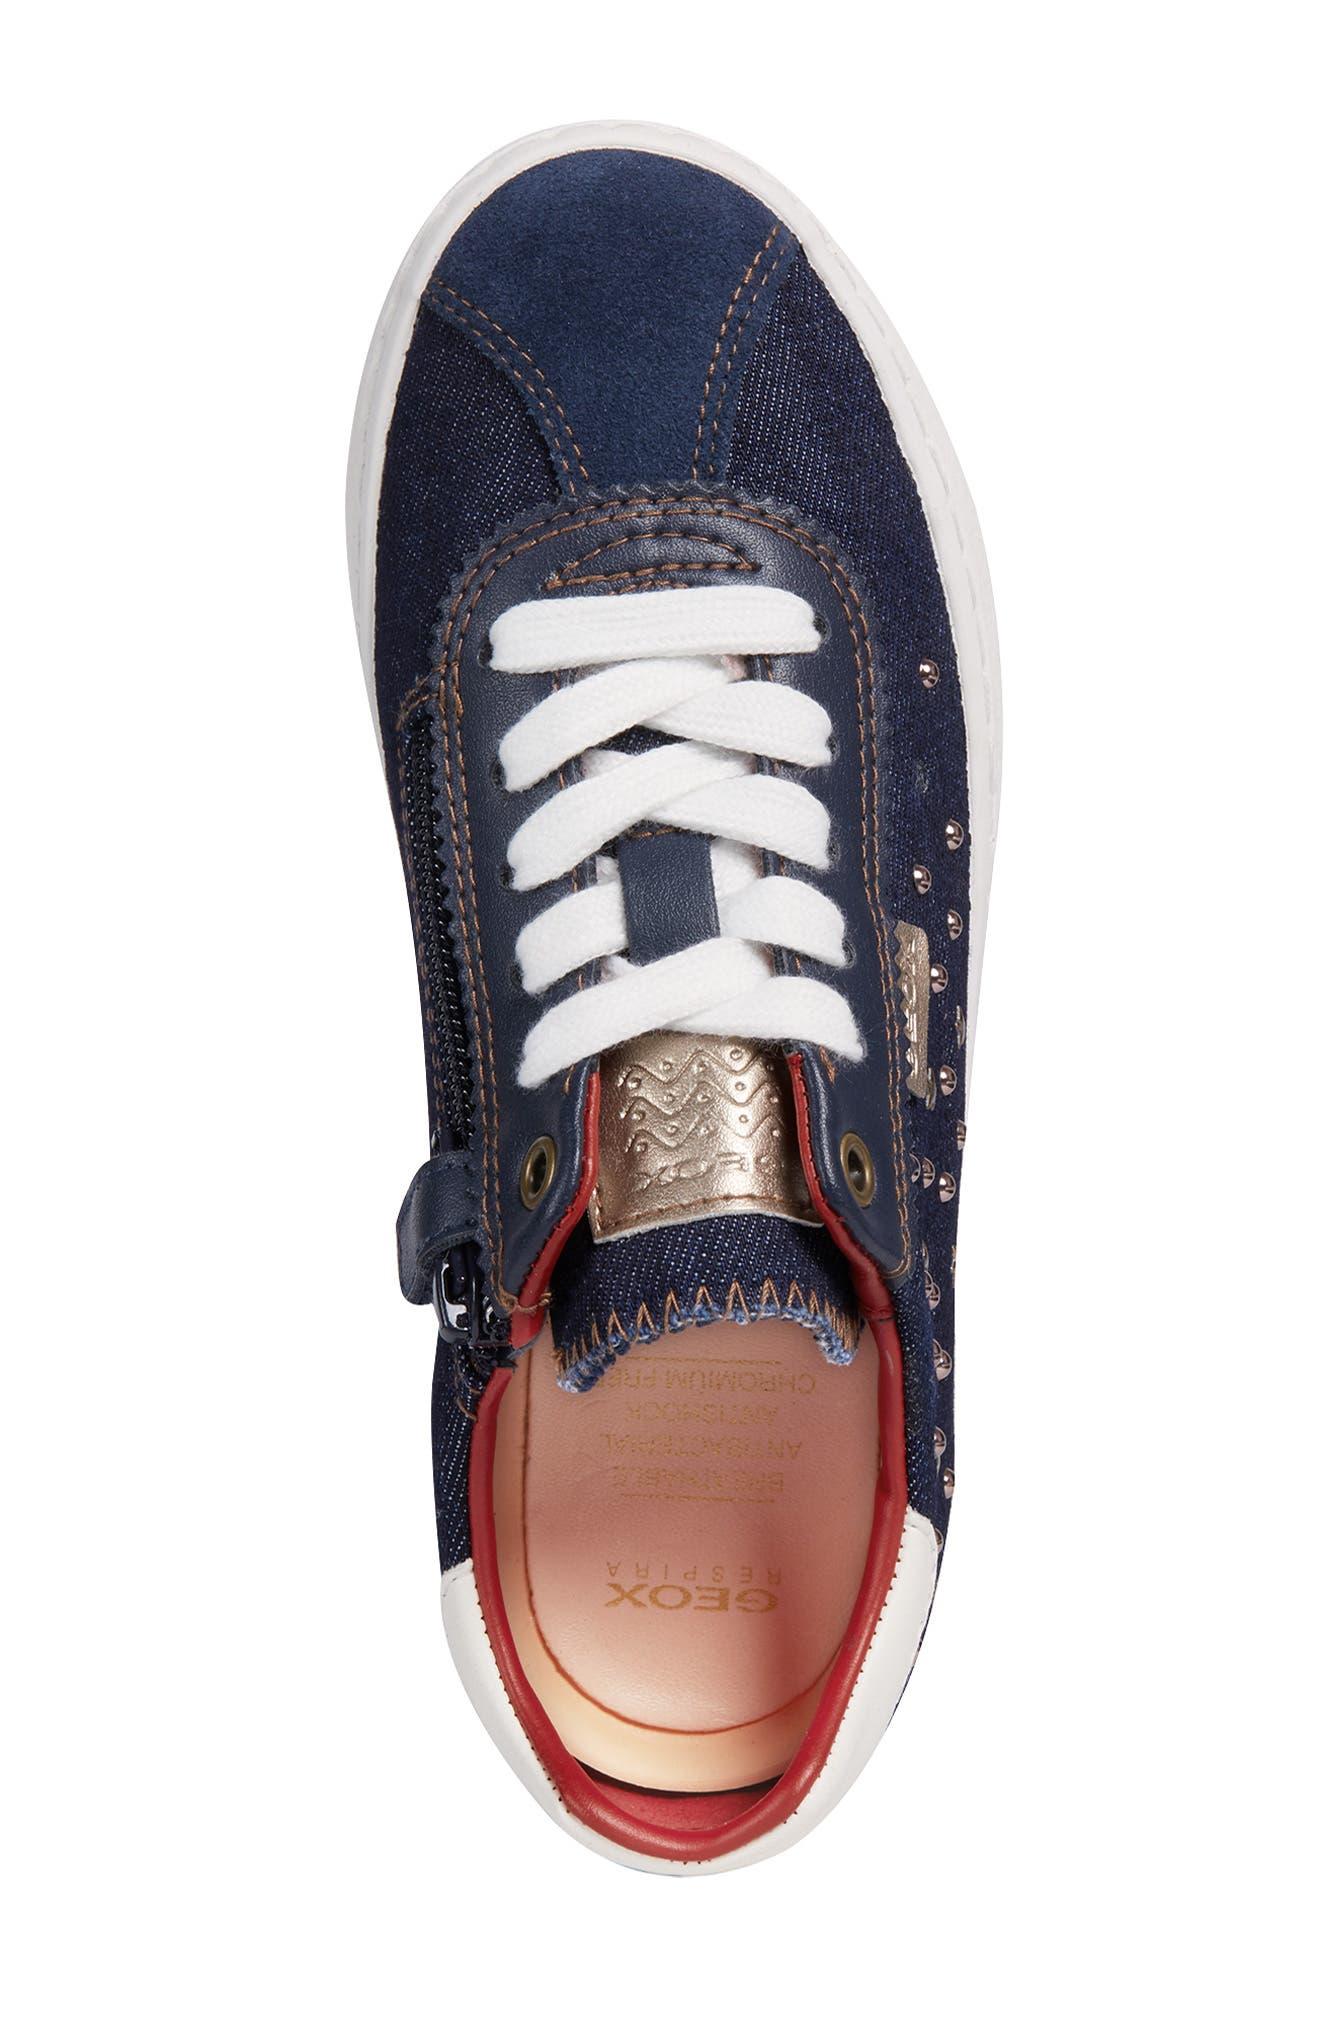 Kilwi Zip Low Top Sneaker,                             Alternate thumbnail 4, color,                             NAVY